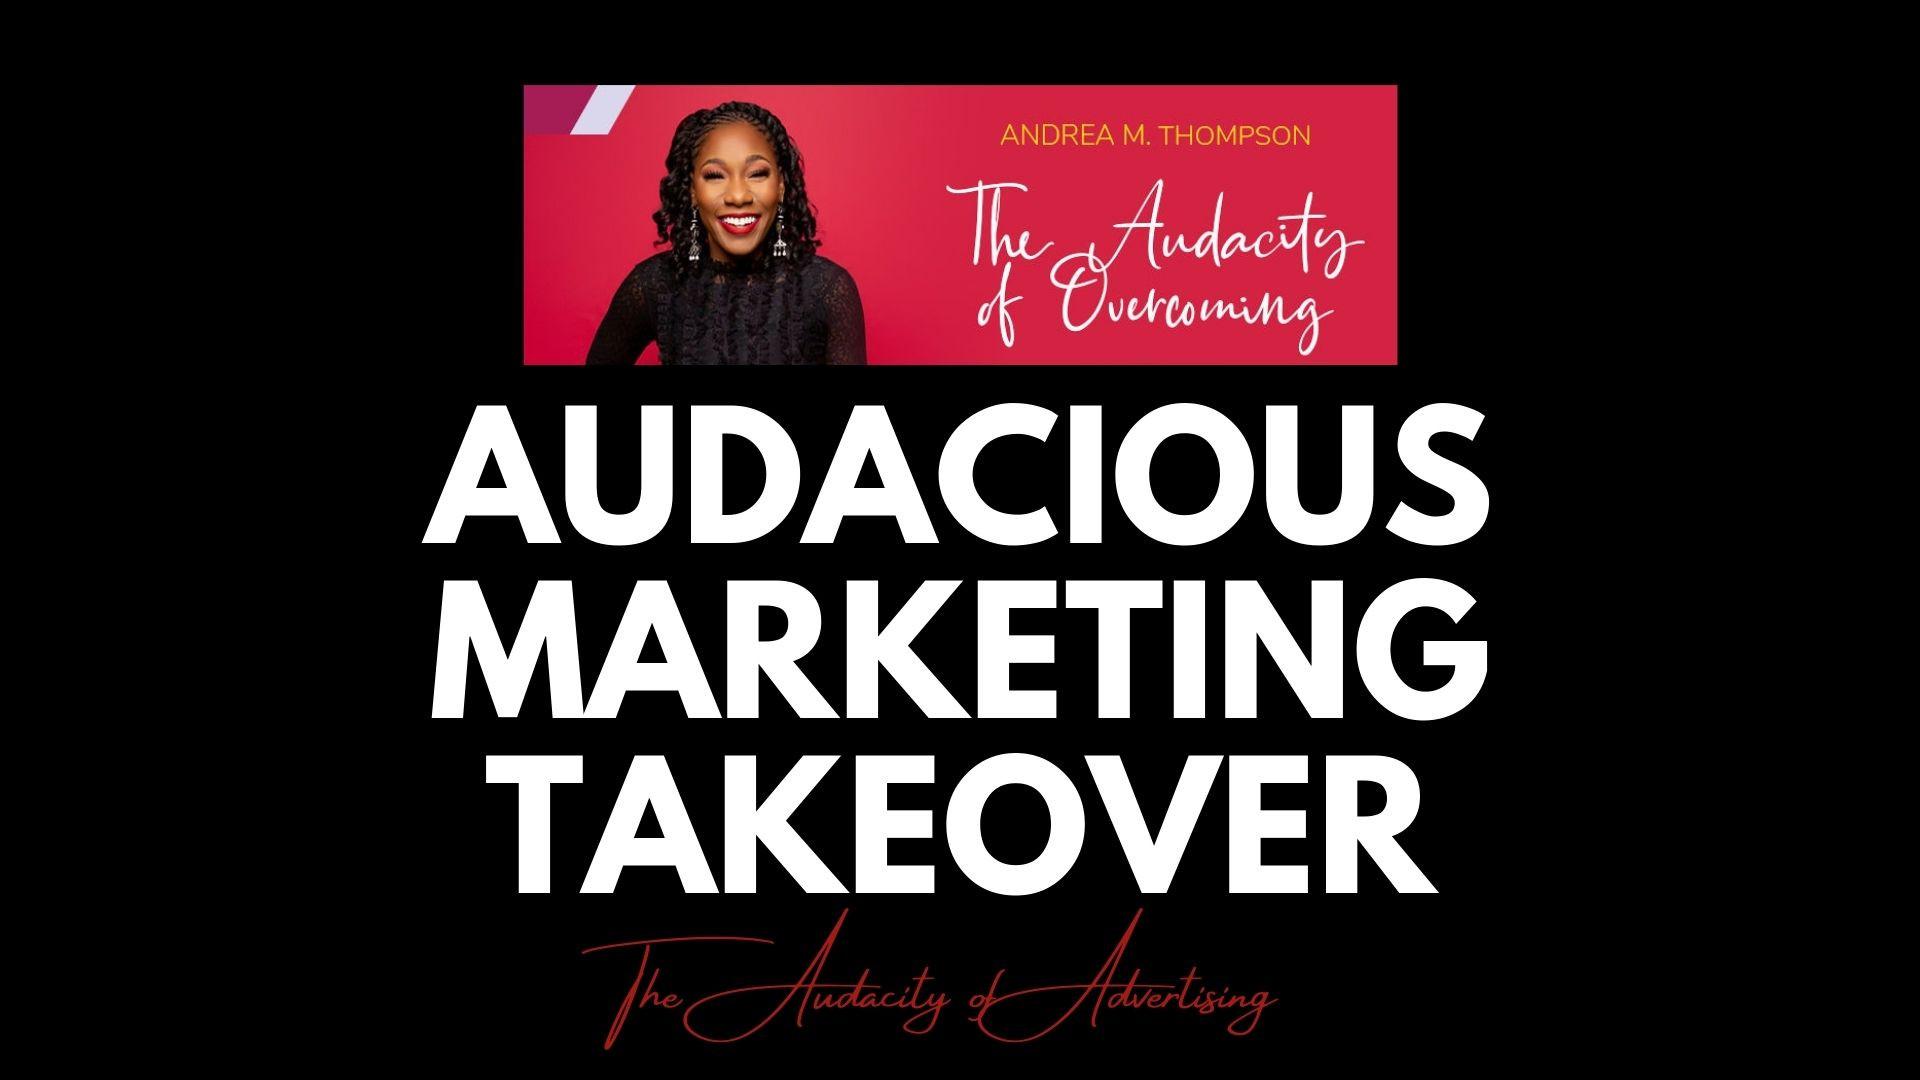 The Audacity of Advertising Q4 2021